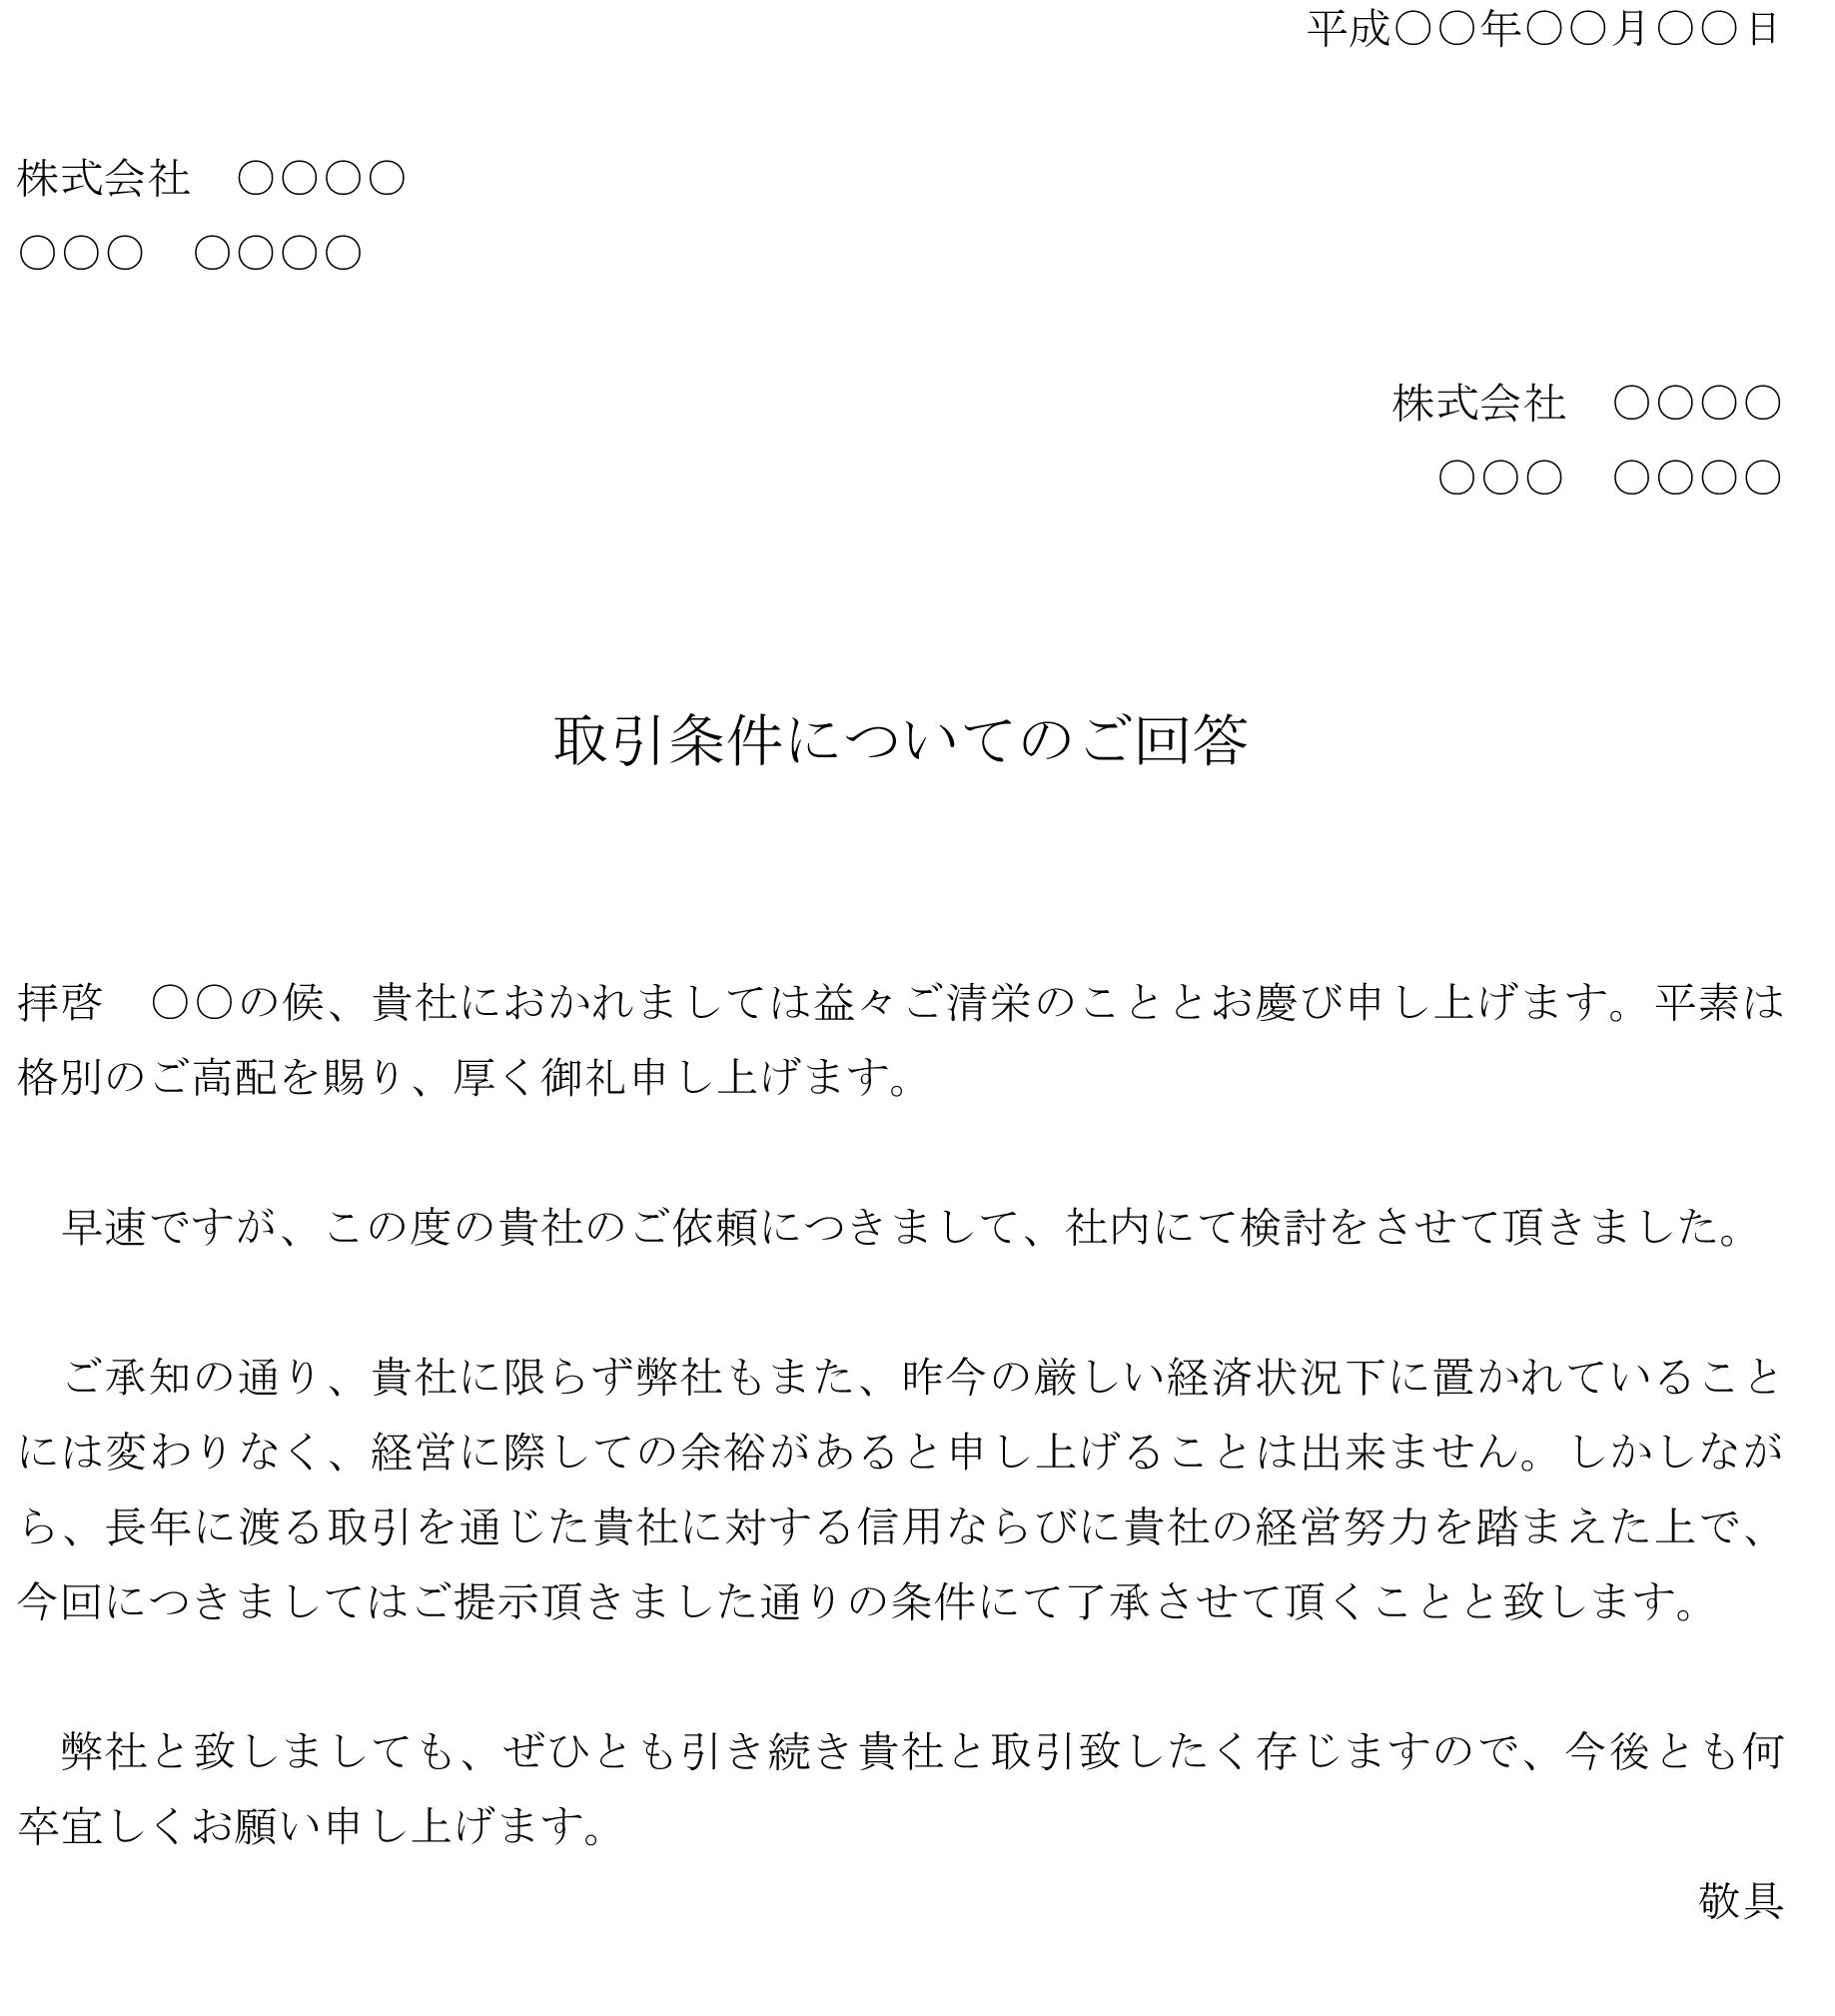 回答書(取引条件の変更依頼を承諾)03